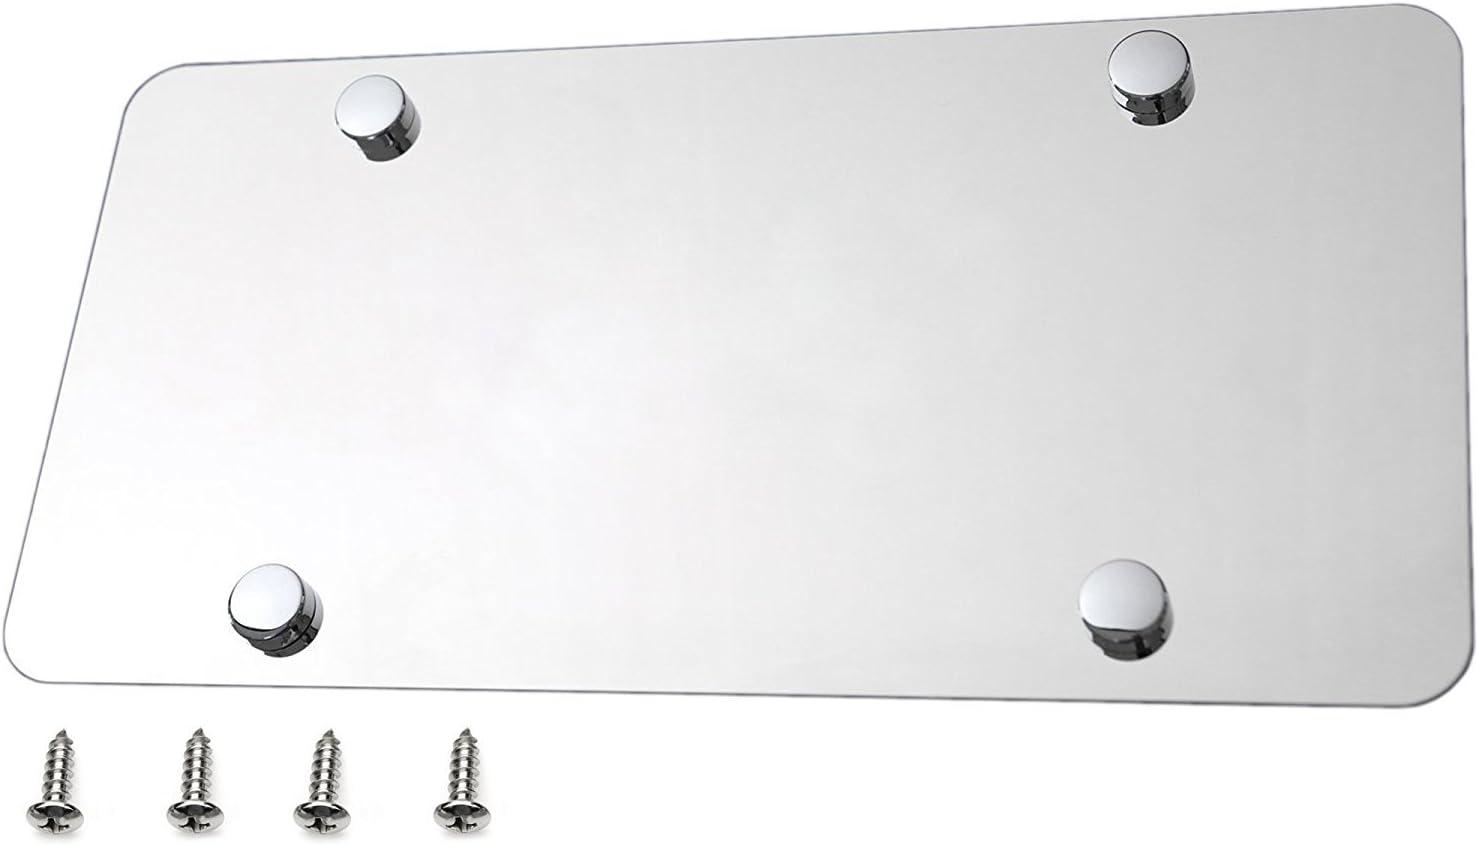 304 Grade License Plate Blank High Quality Steel Steel